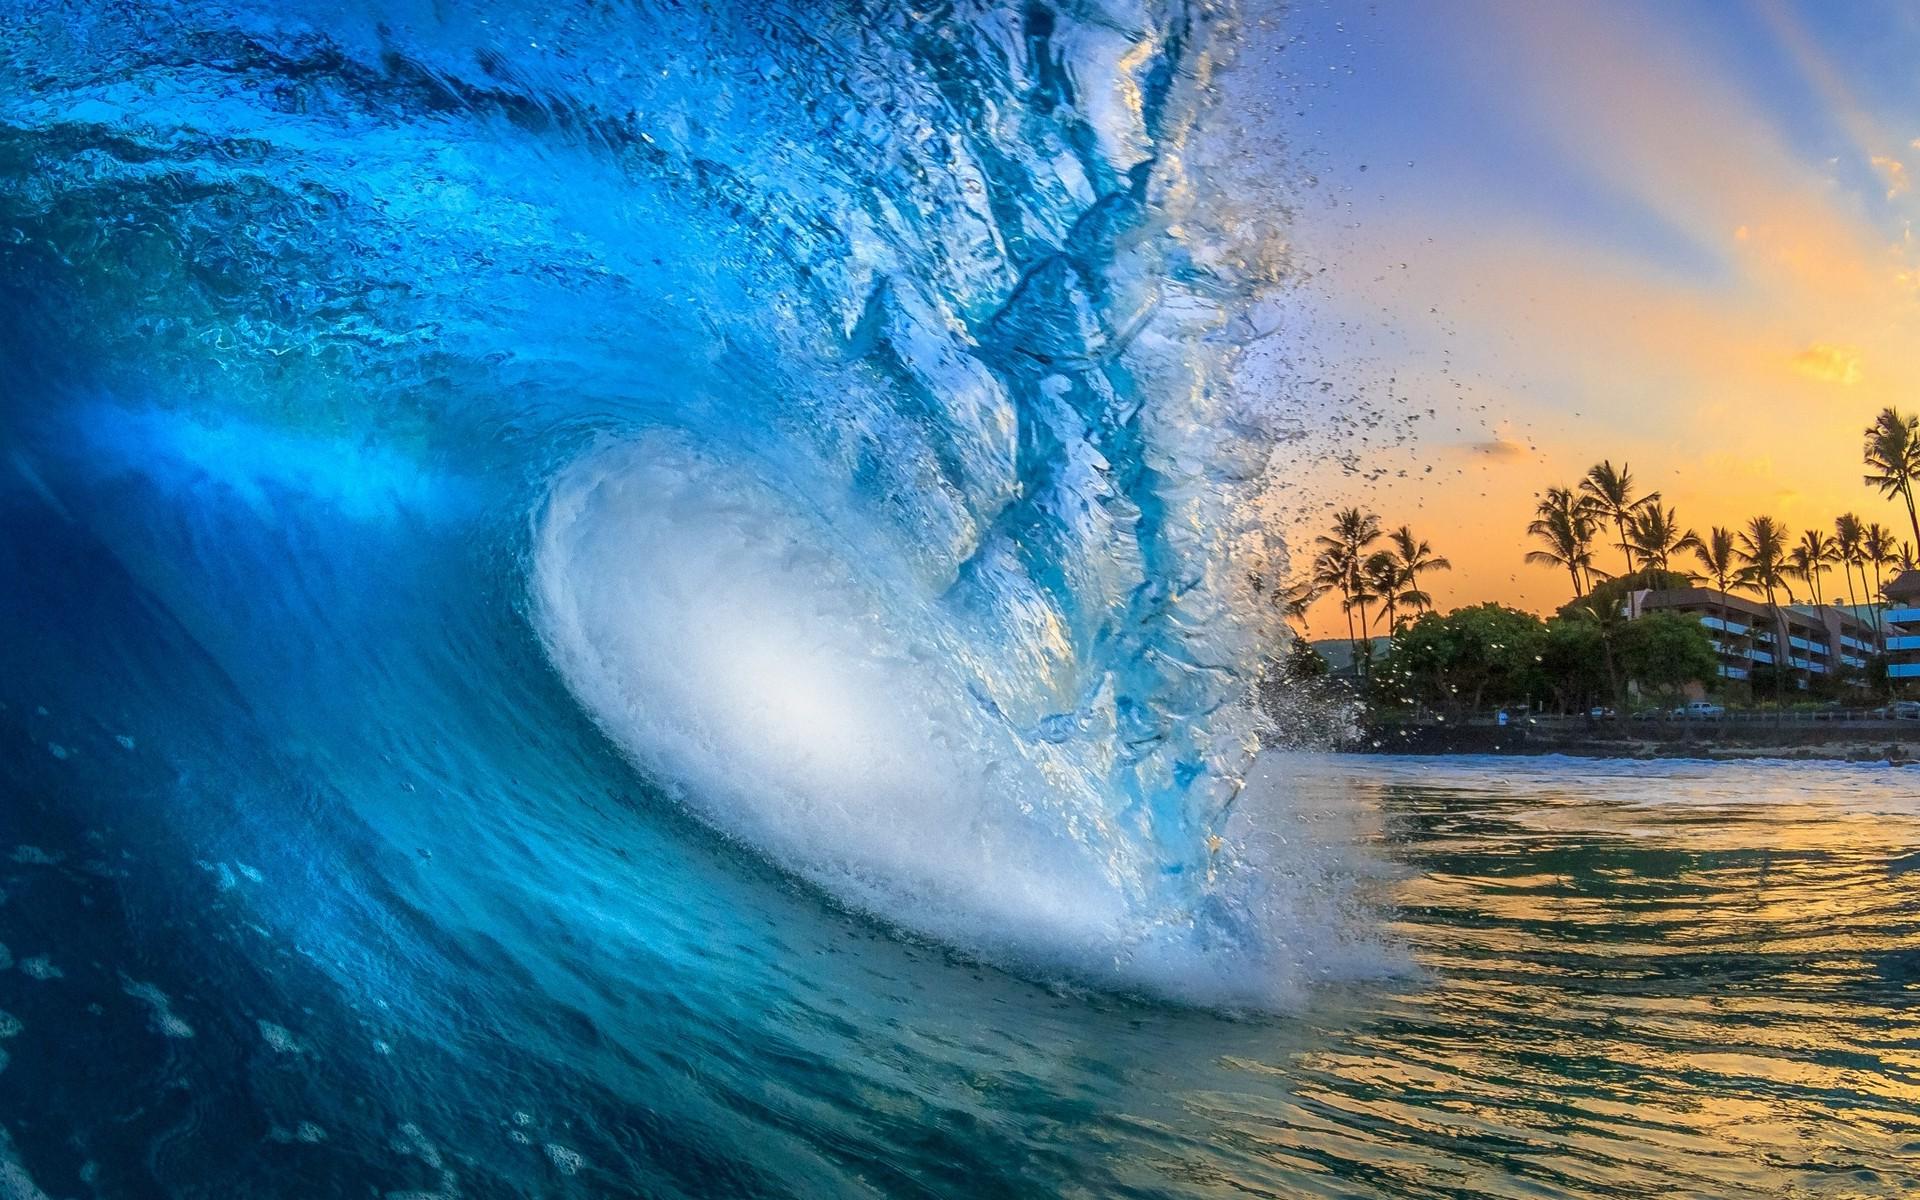 1920x1200 Px Beach Blue Building Hawaii Landscape Nature Palm Trees Sea Sun Rays Sunrise Water Waves